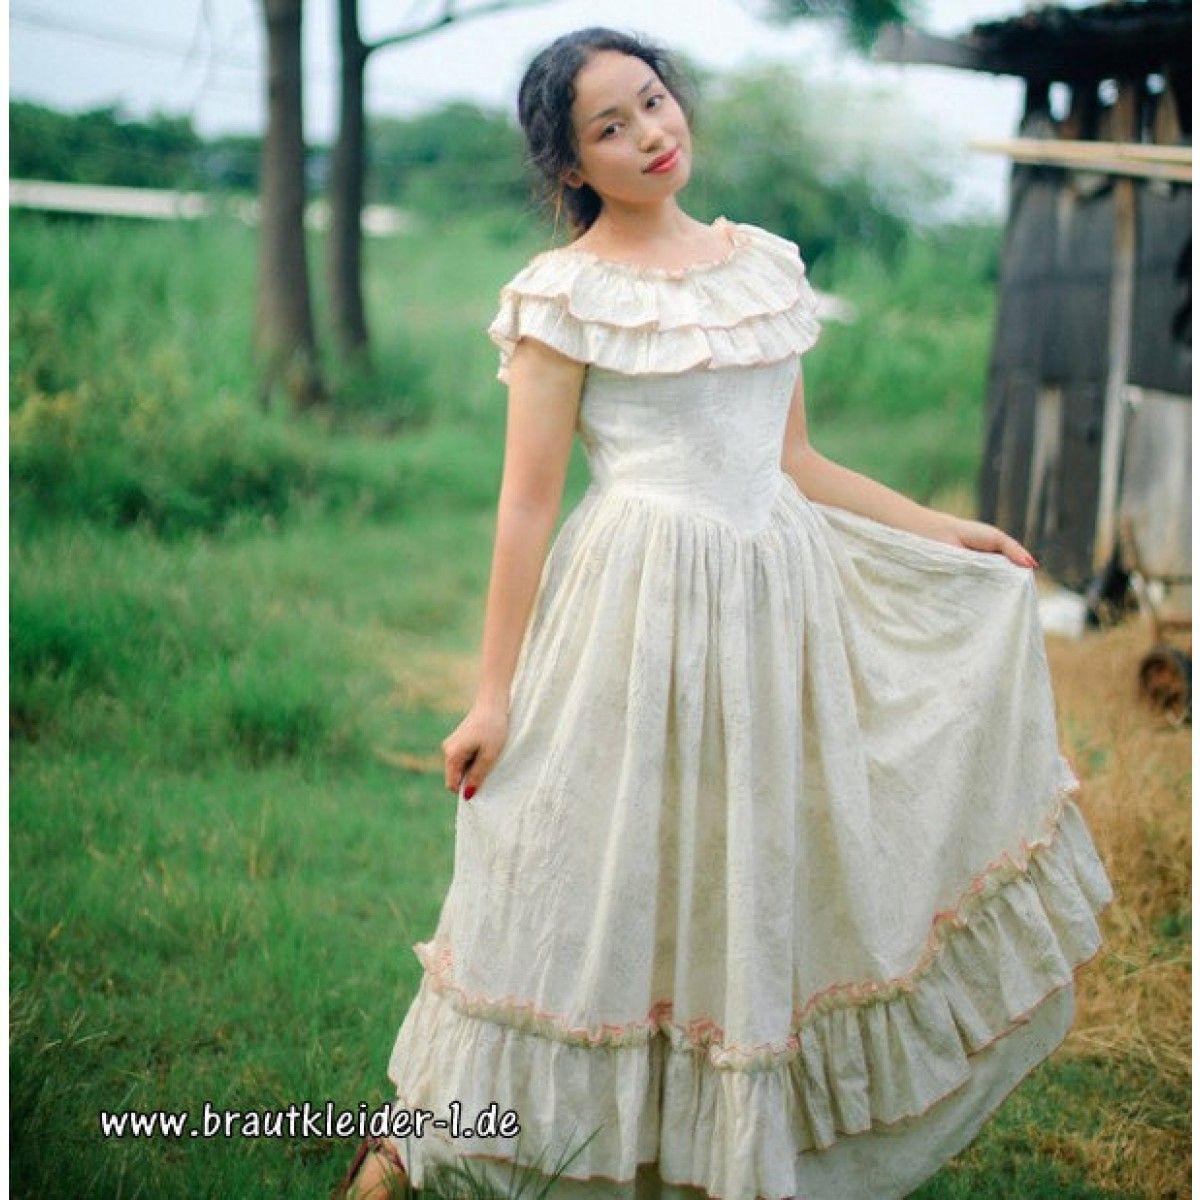 Baumwoll Vintage Kleid Fuer Den Standesamt Lang #braut